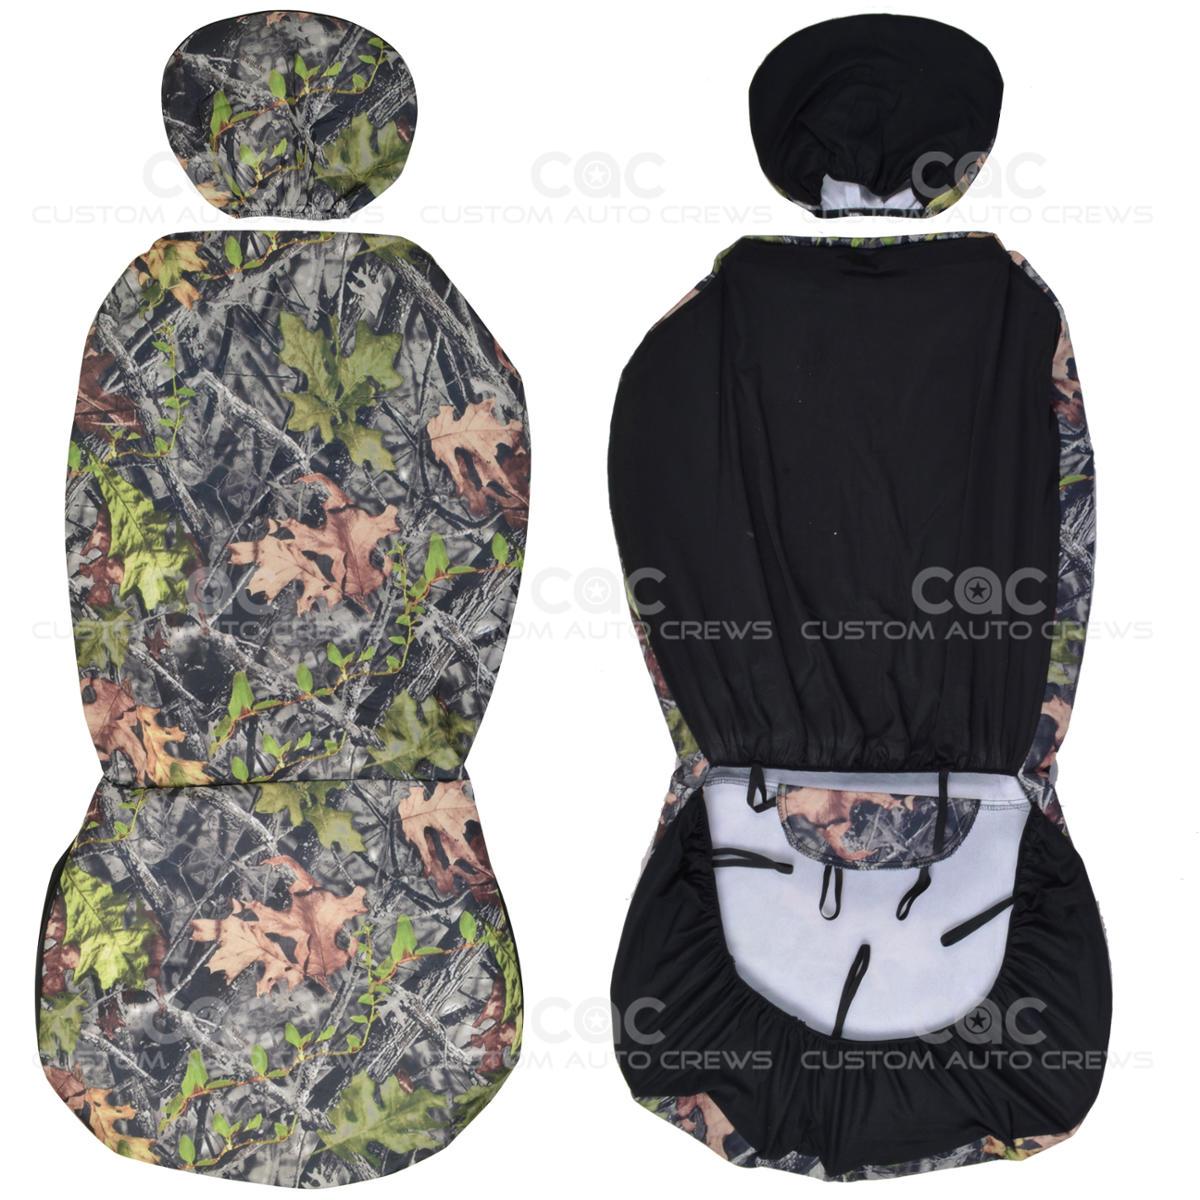 4 Pc Camo Car Seat Cover And 4 Pc Camo Carpet Floor Mats